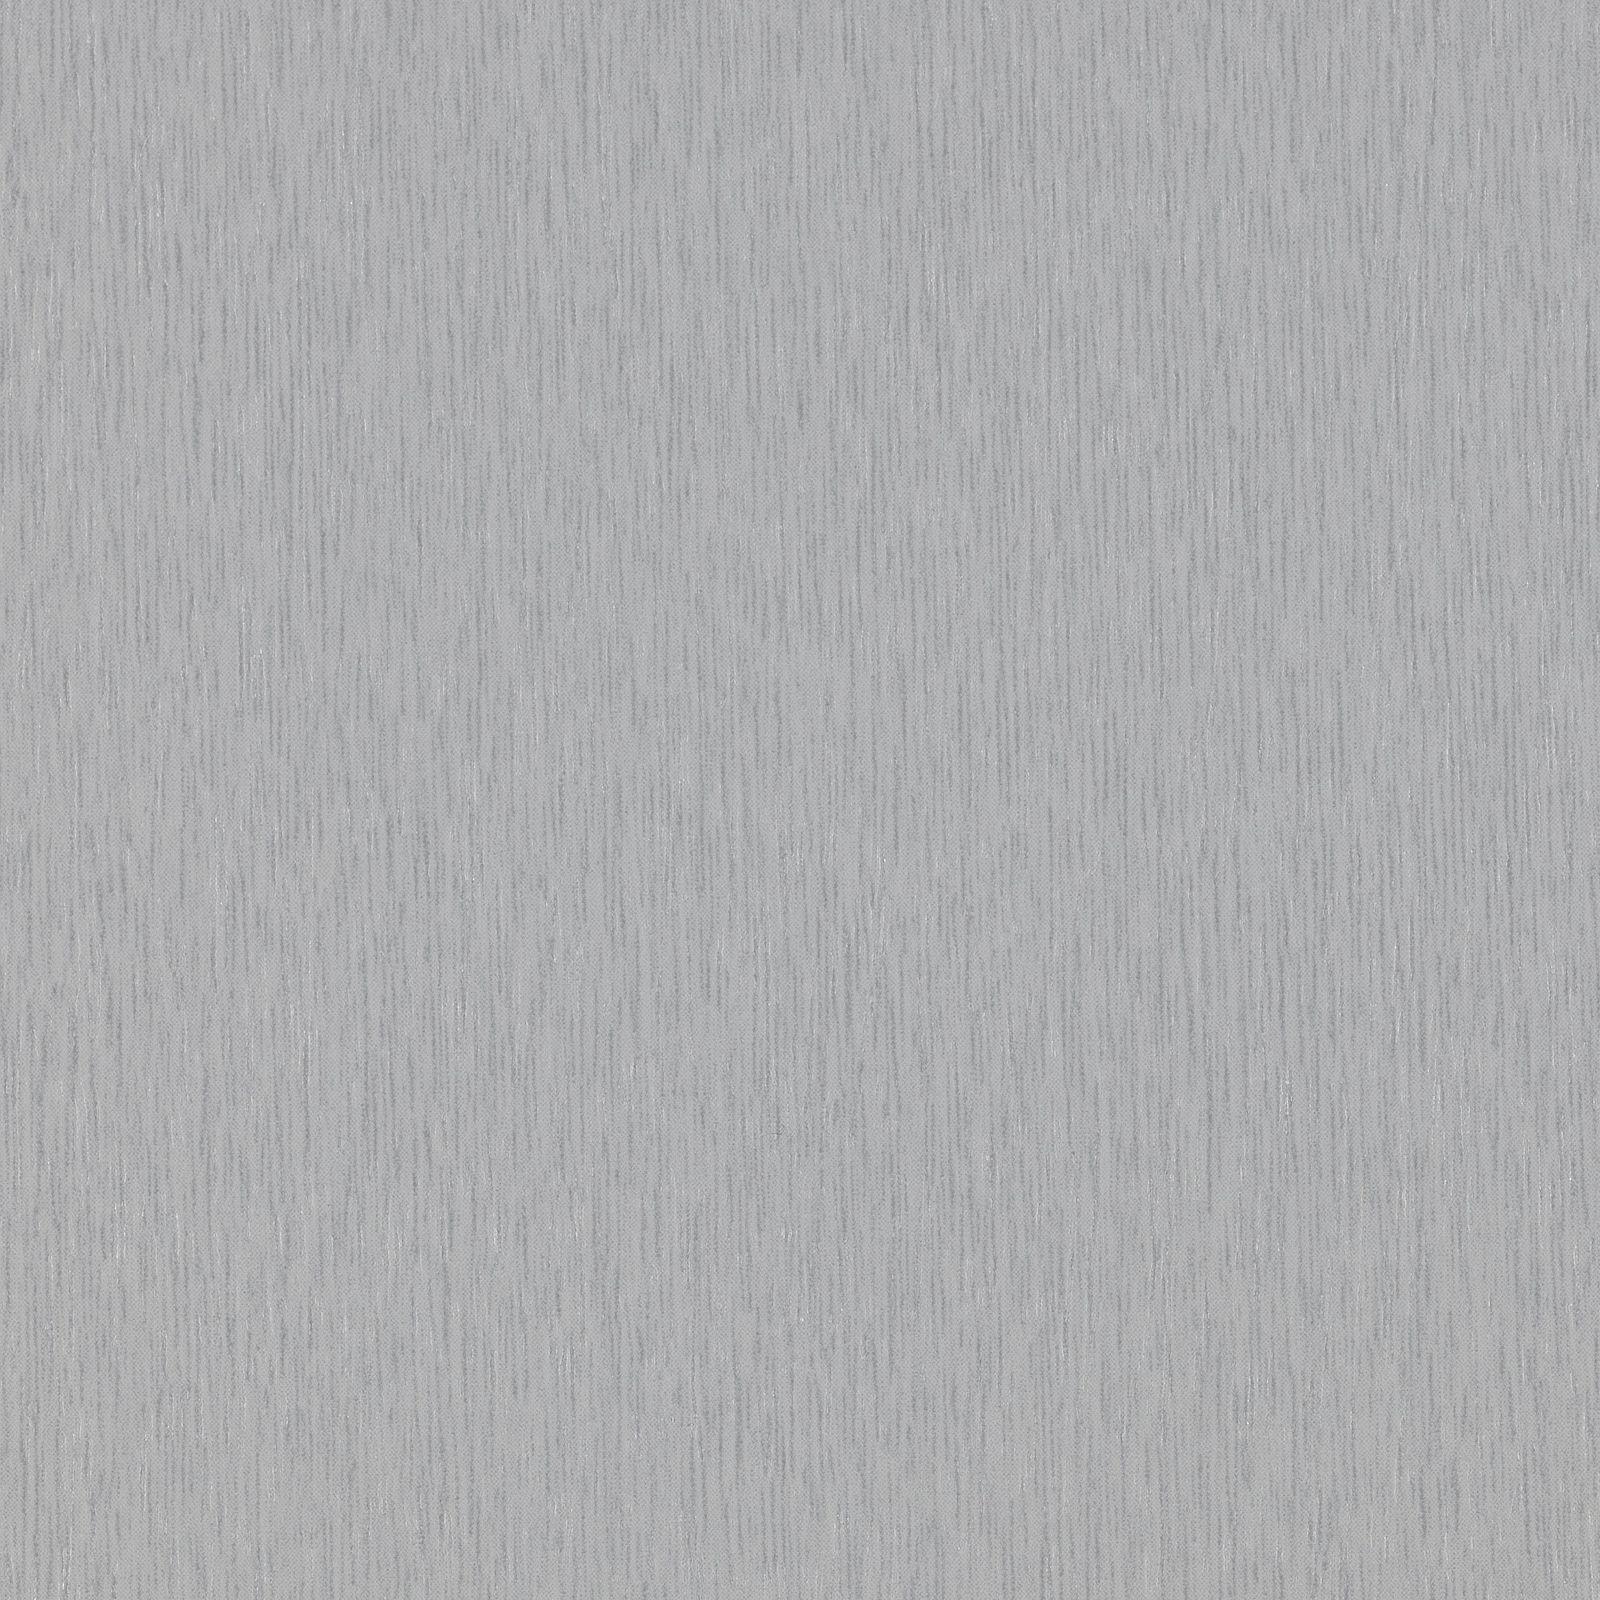 Hallestad Countertop Double Sided White Aluminum Effect Aluminum Effect Metal Effect Edge Laminate With Metal Effe In 2020 Countertops Laminate Countertops Laminate